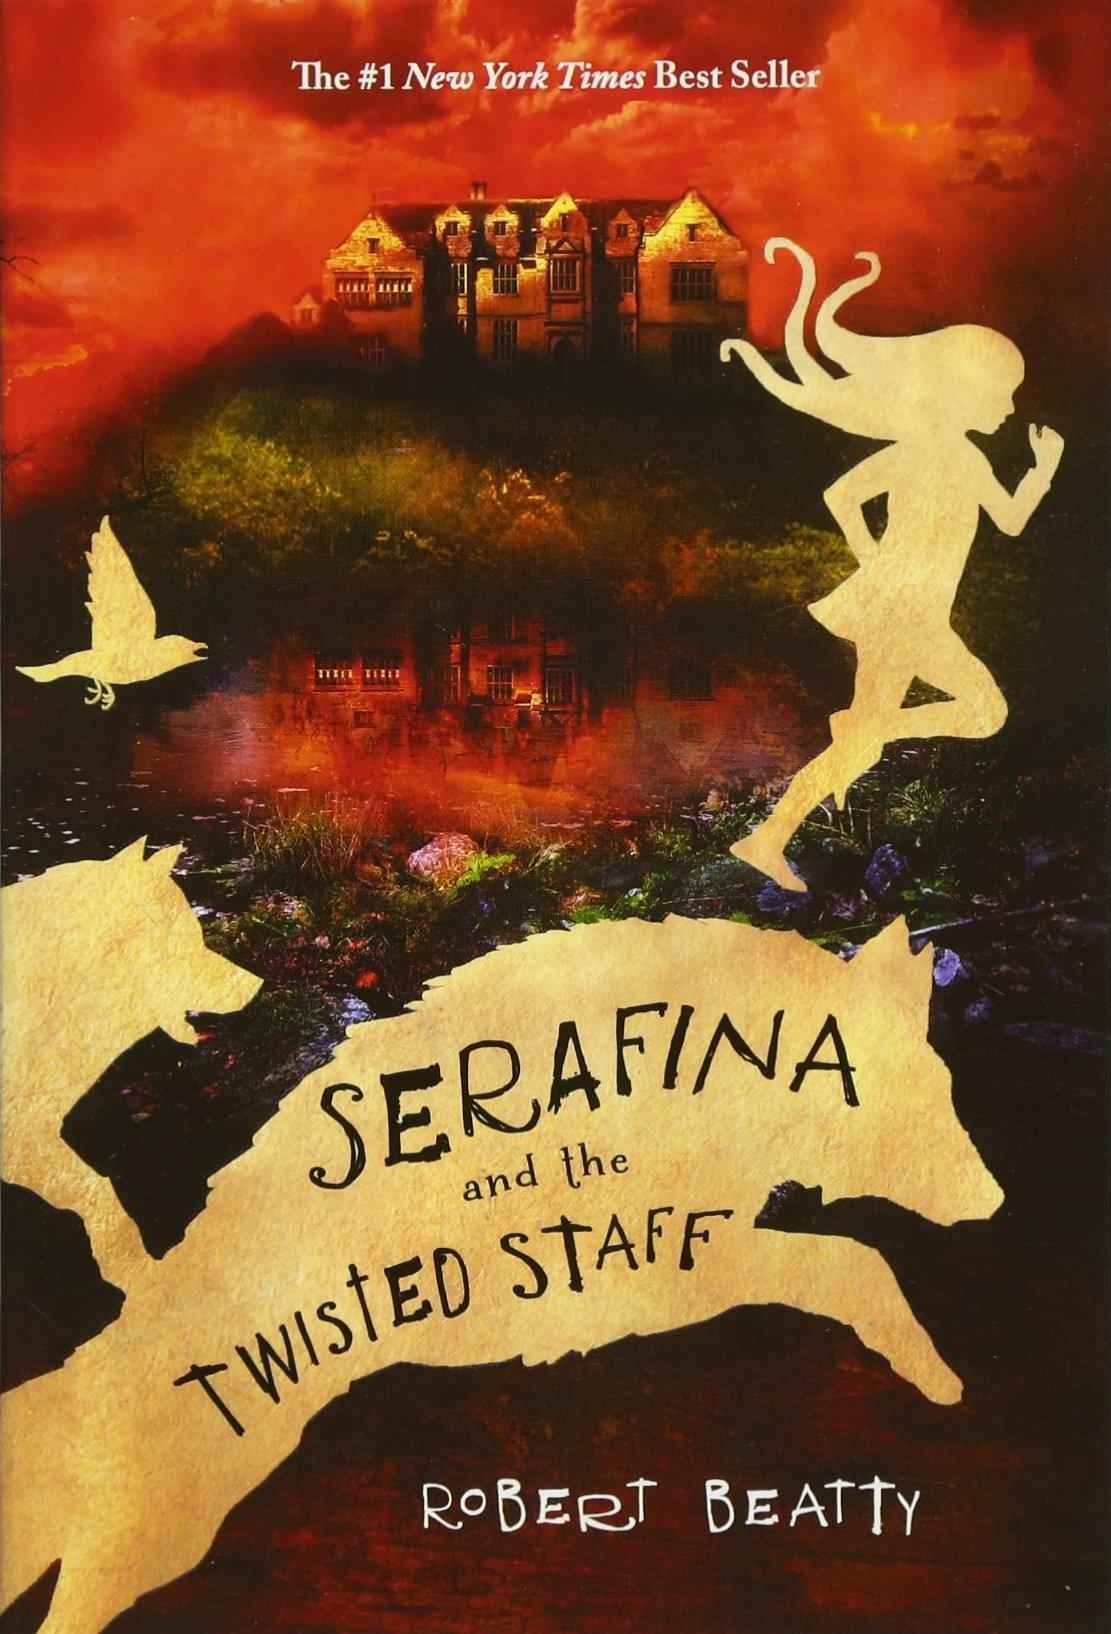 Serafina and the Twisted Staff by Robert Beatty